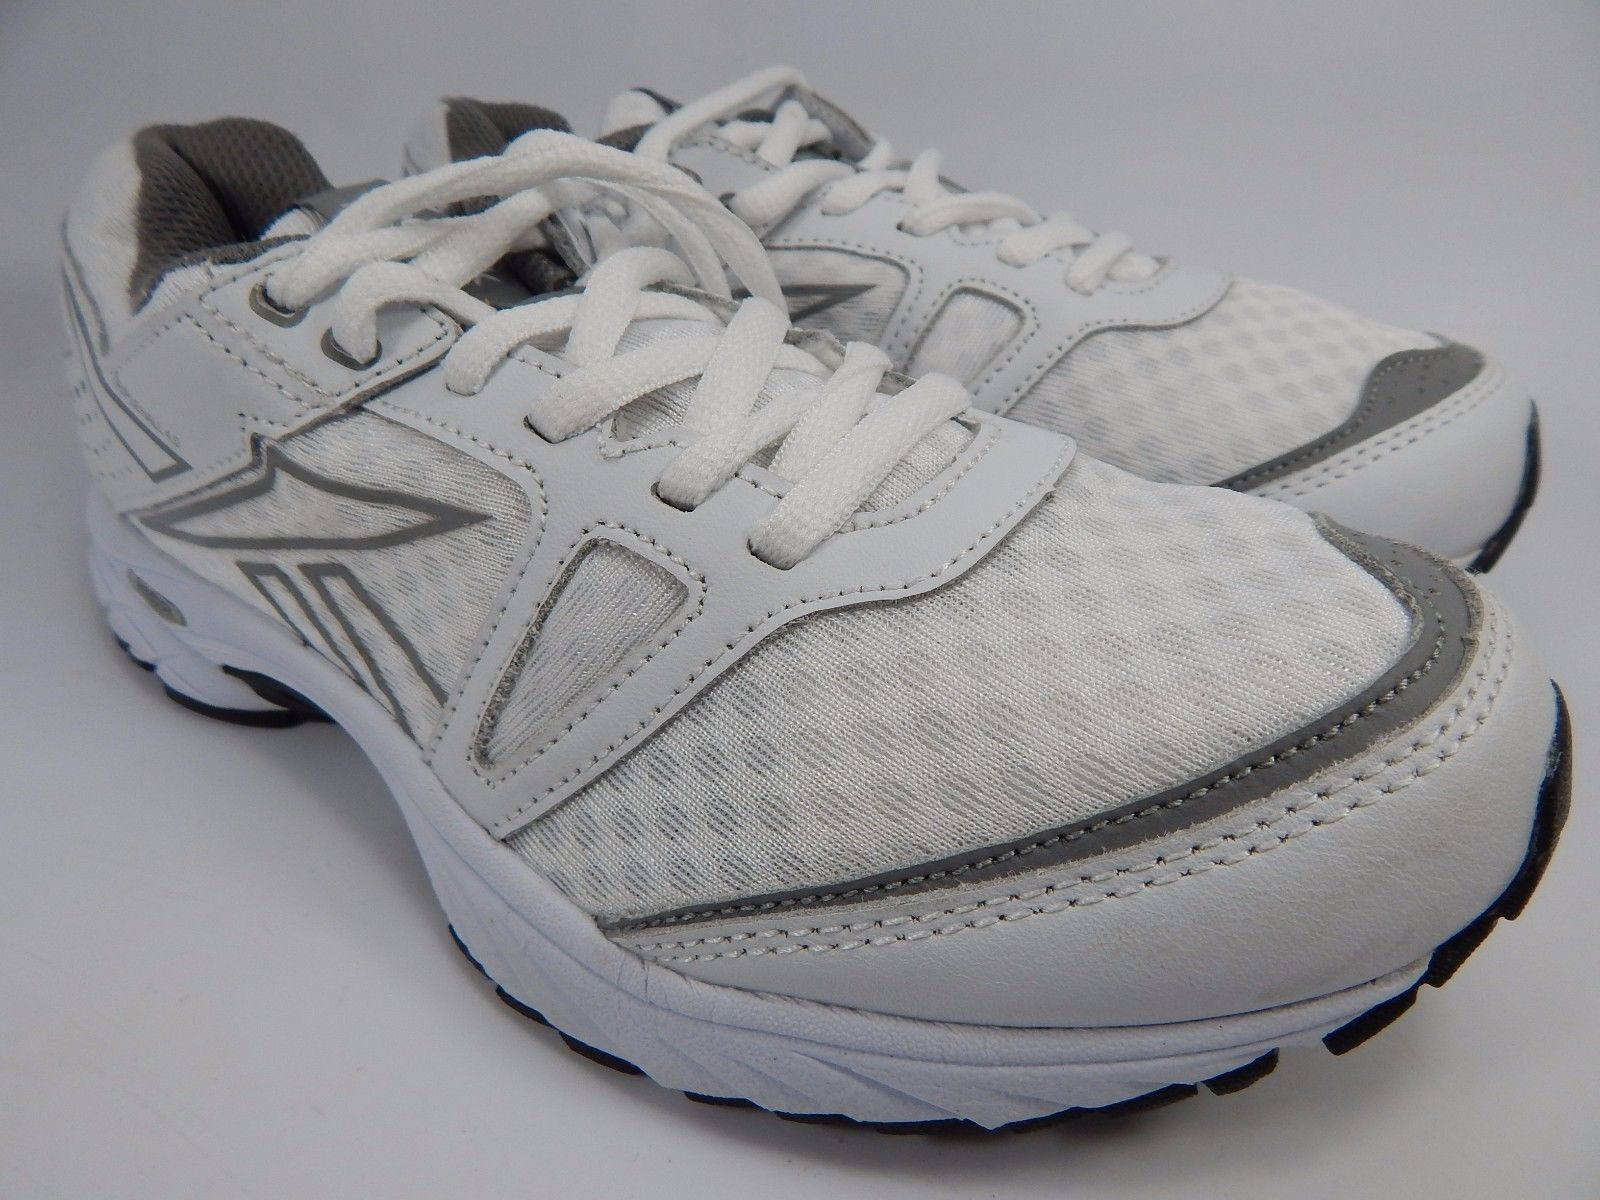 Reebok Triplehall 4.0 Women's Running Shoes Size US 6 M (B) EU 36 White V70078